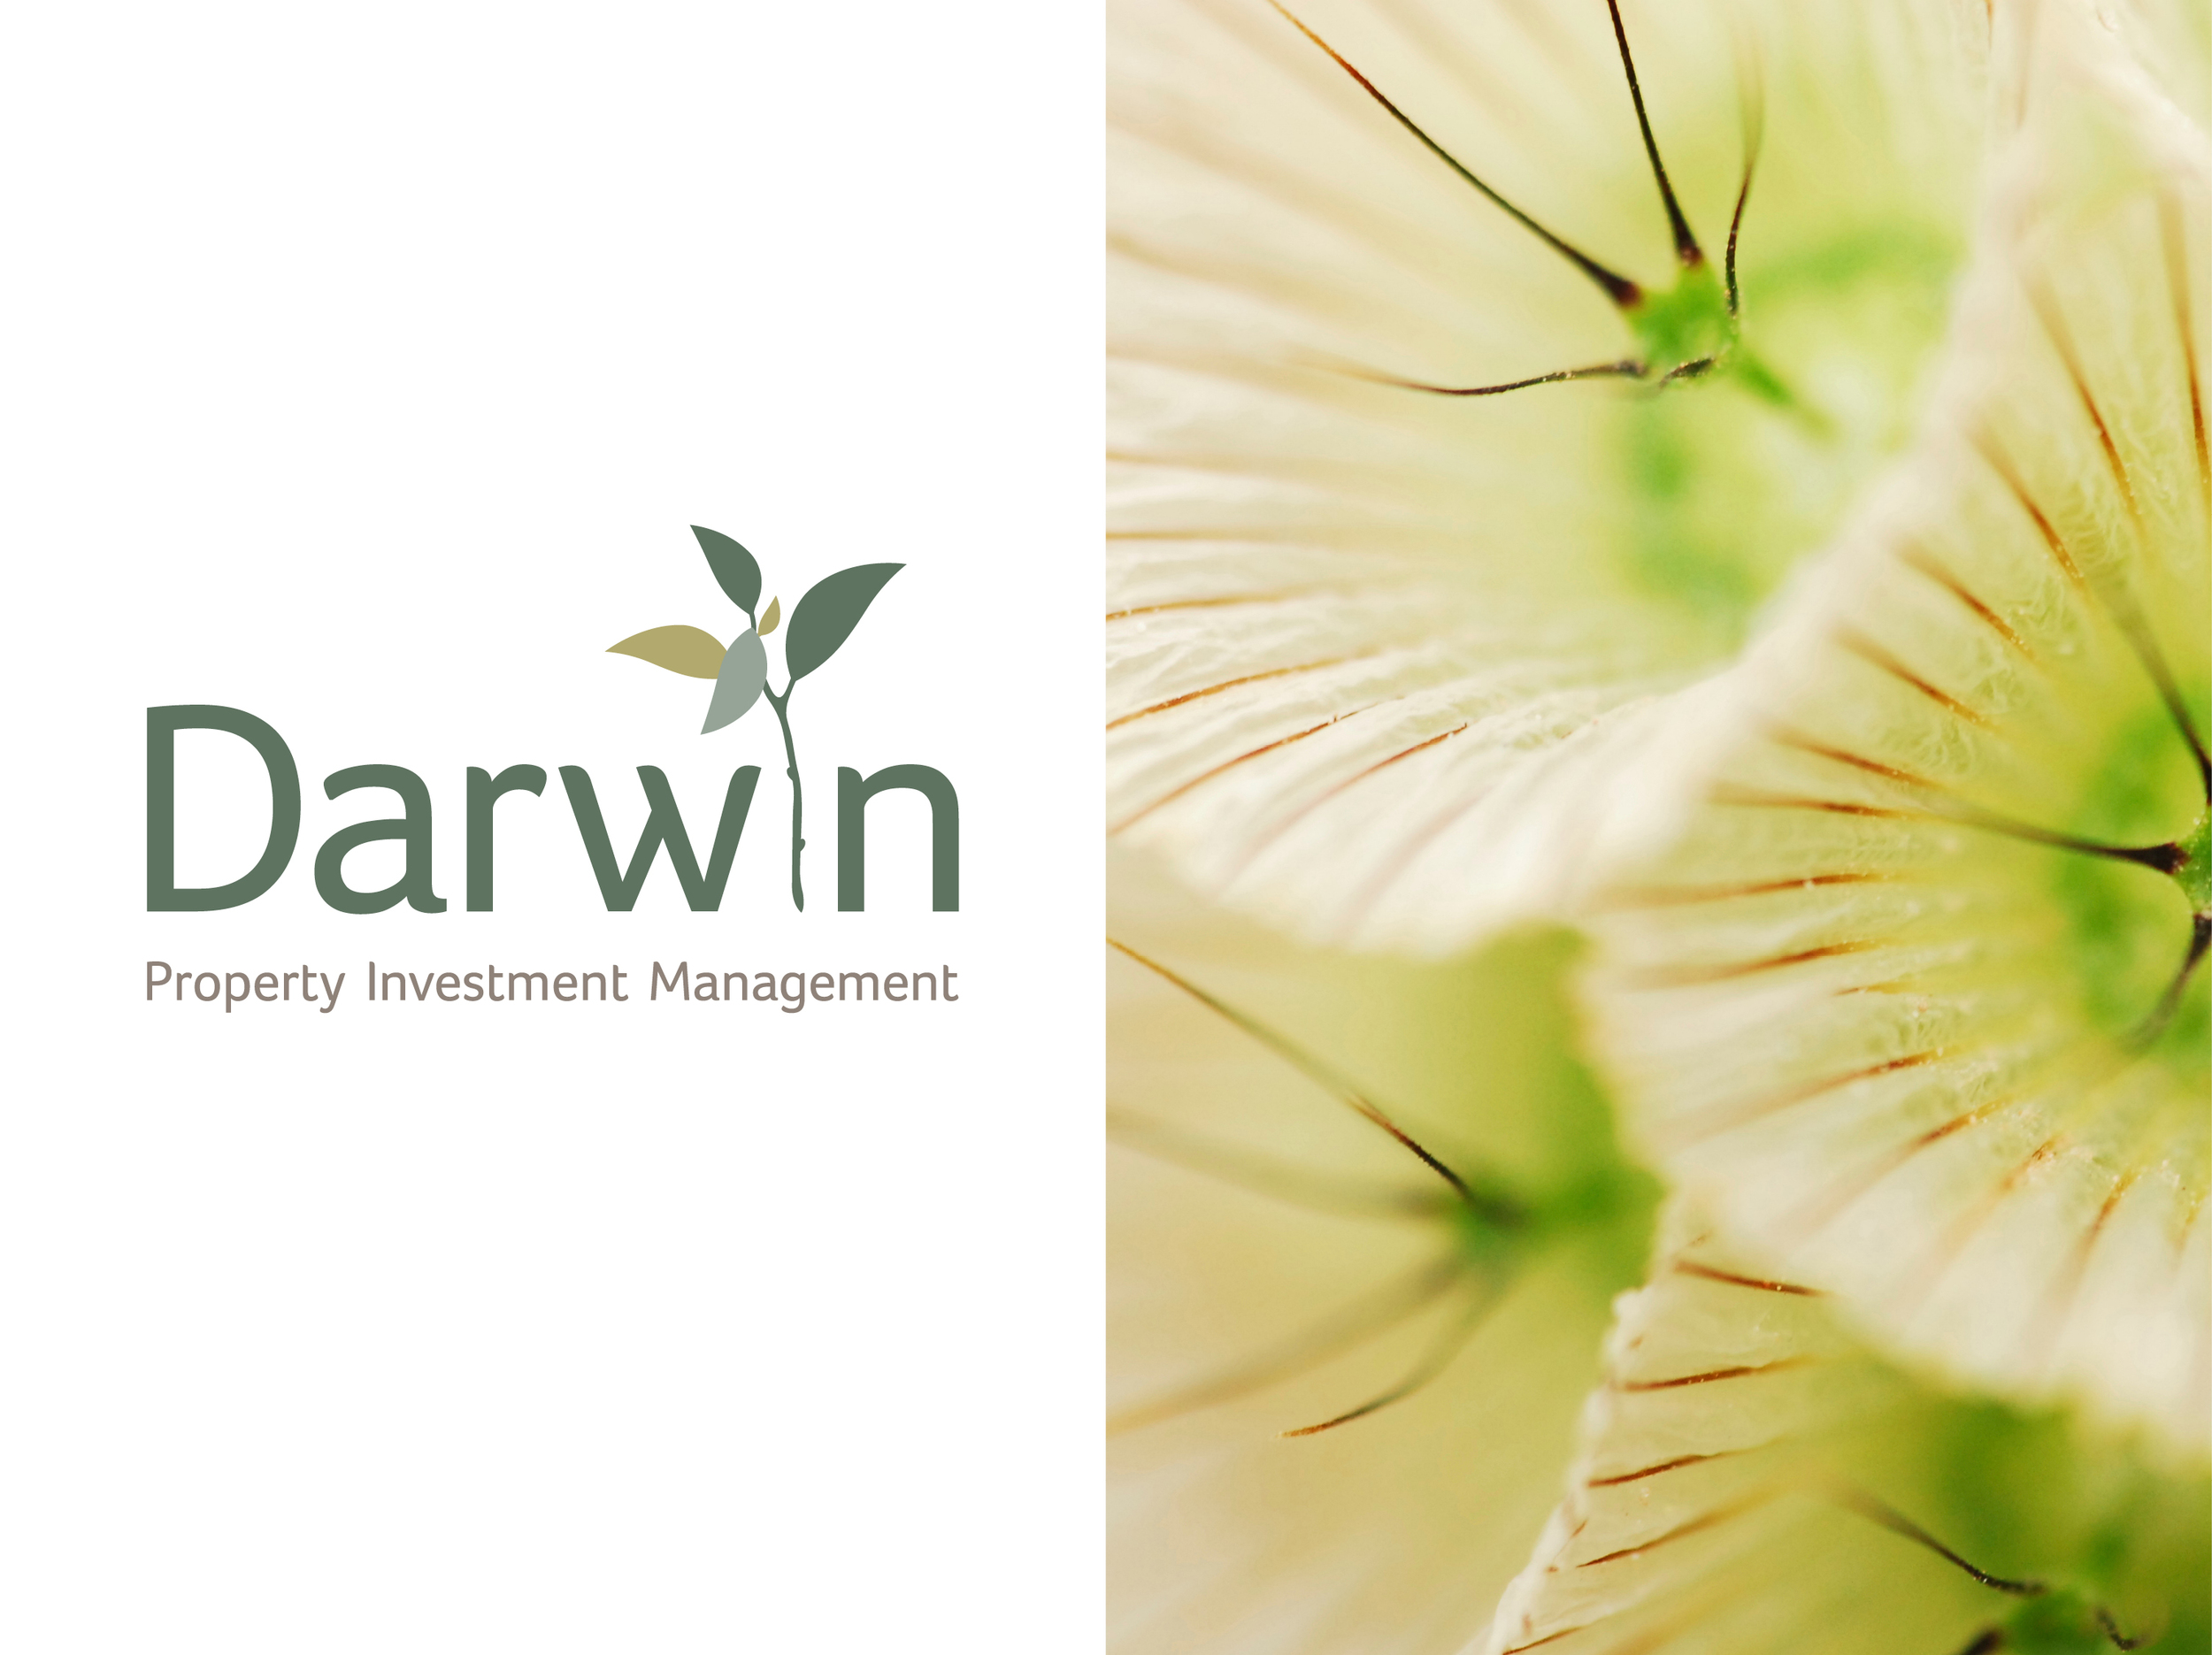 Darwin_1804x1350.jpg